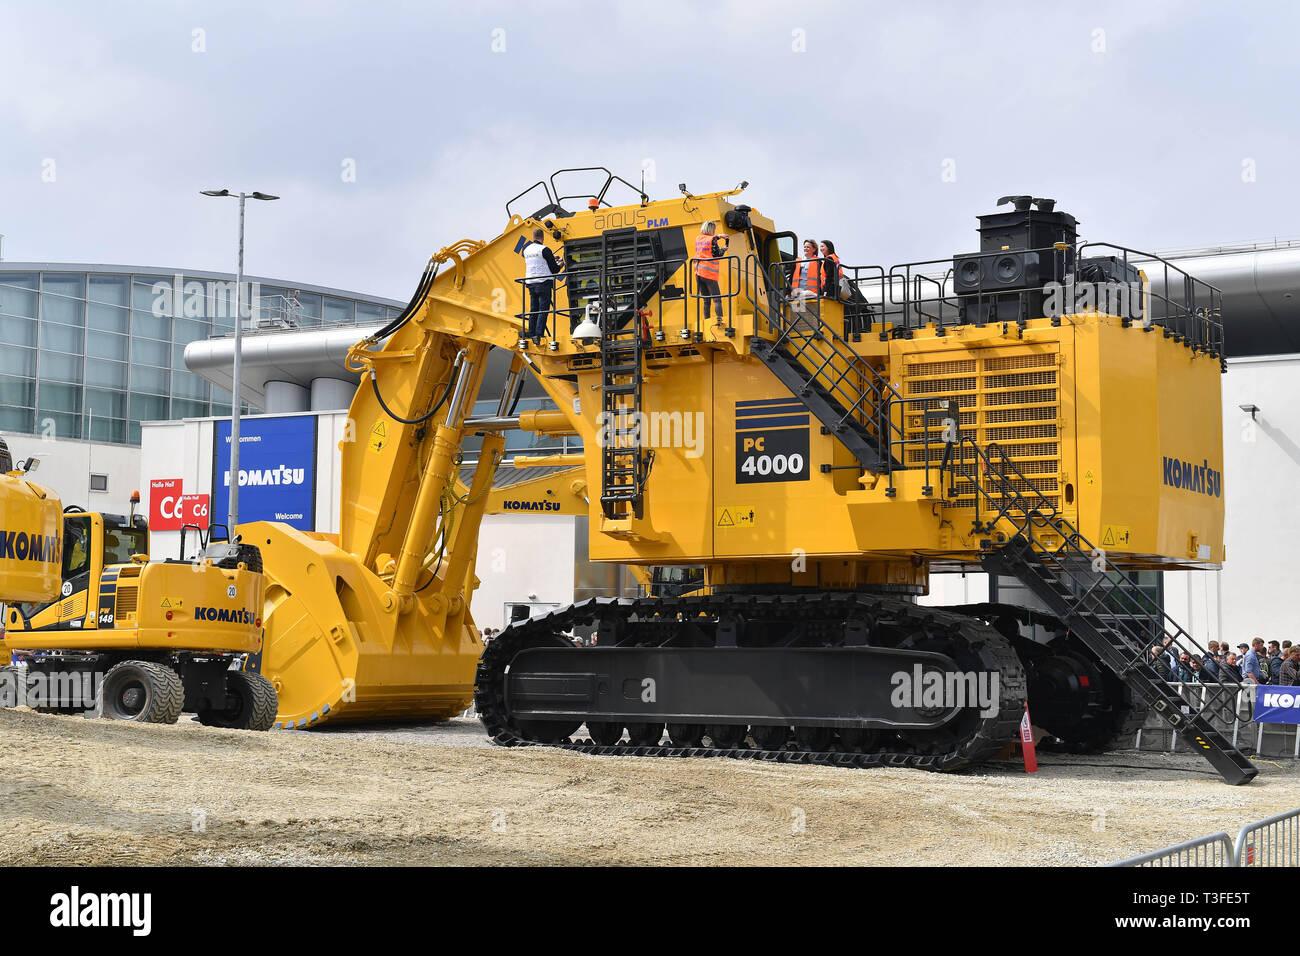 09th Apr, 2019. a Komatsu excavator. Faszination bauma 2019